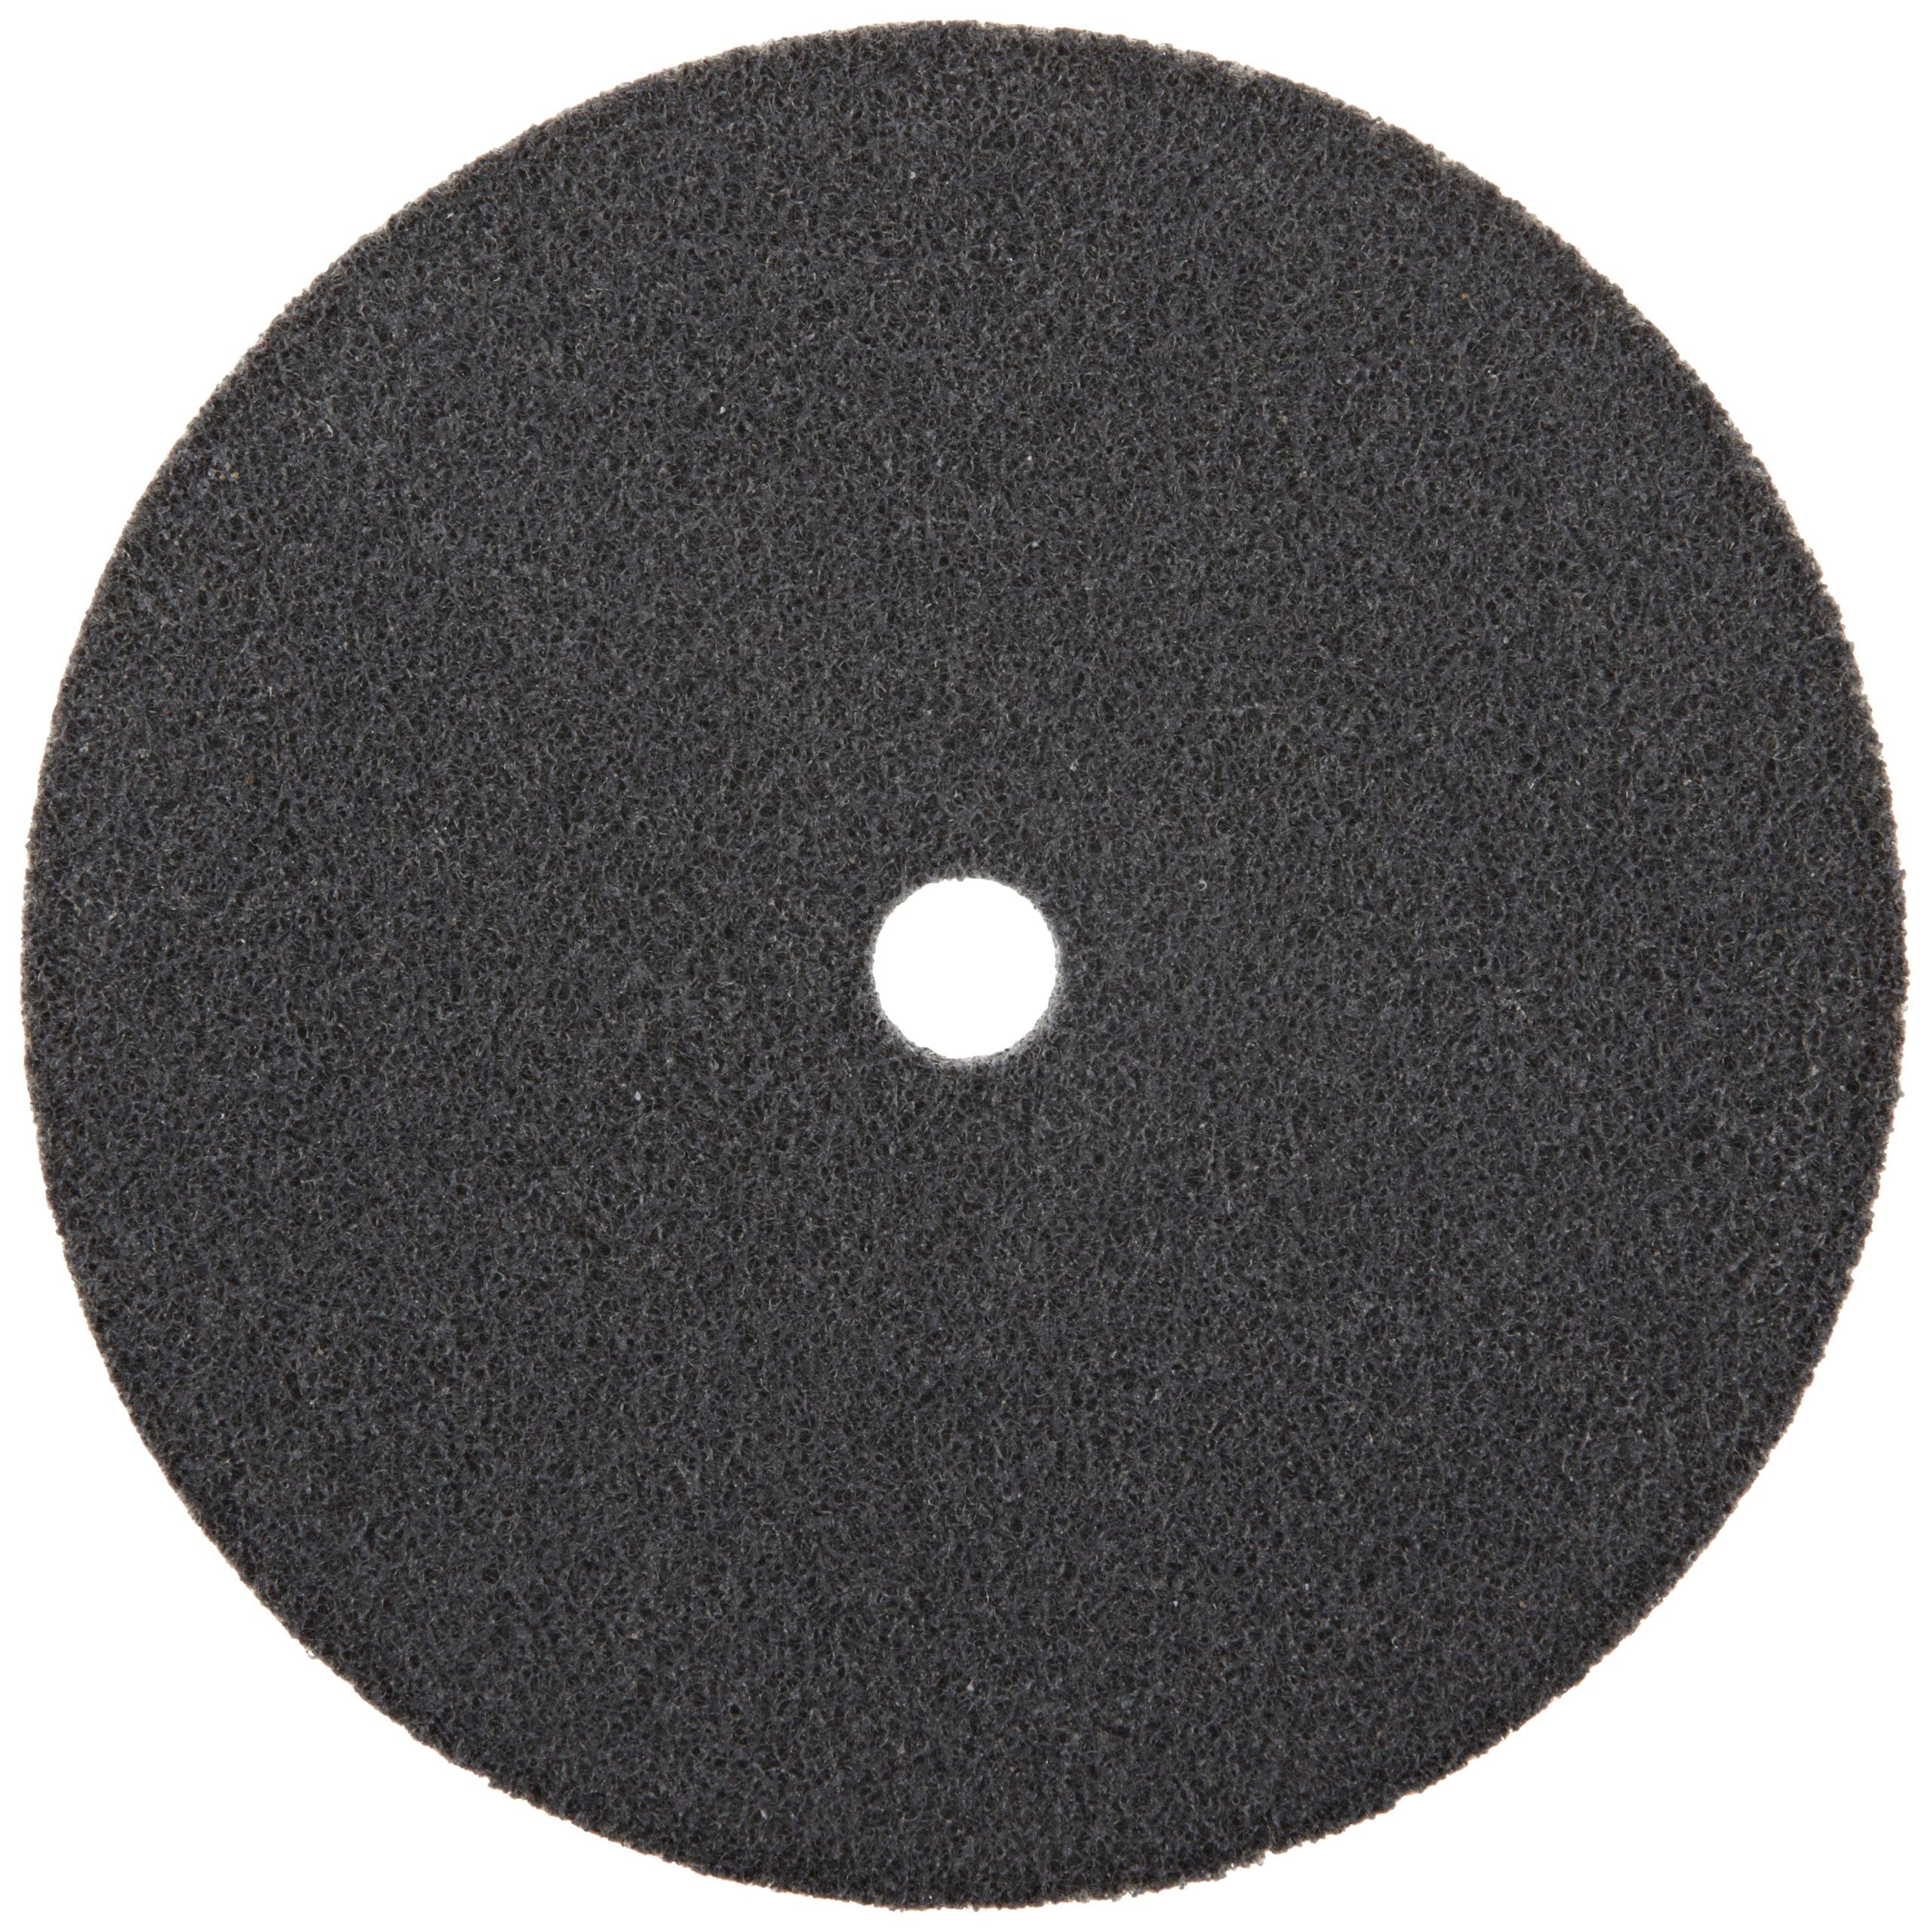 Scotch-Brite EXL Unitized Wheel, Silicon Carbide, 5000 rpm, 6'' Diameter, 5/8'' Arbor, 2S Fine Grit (Pack of 1)